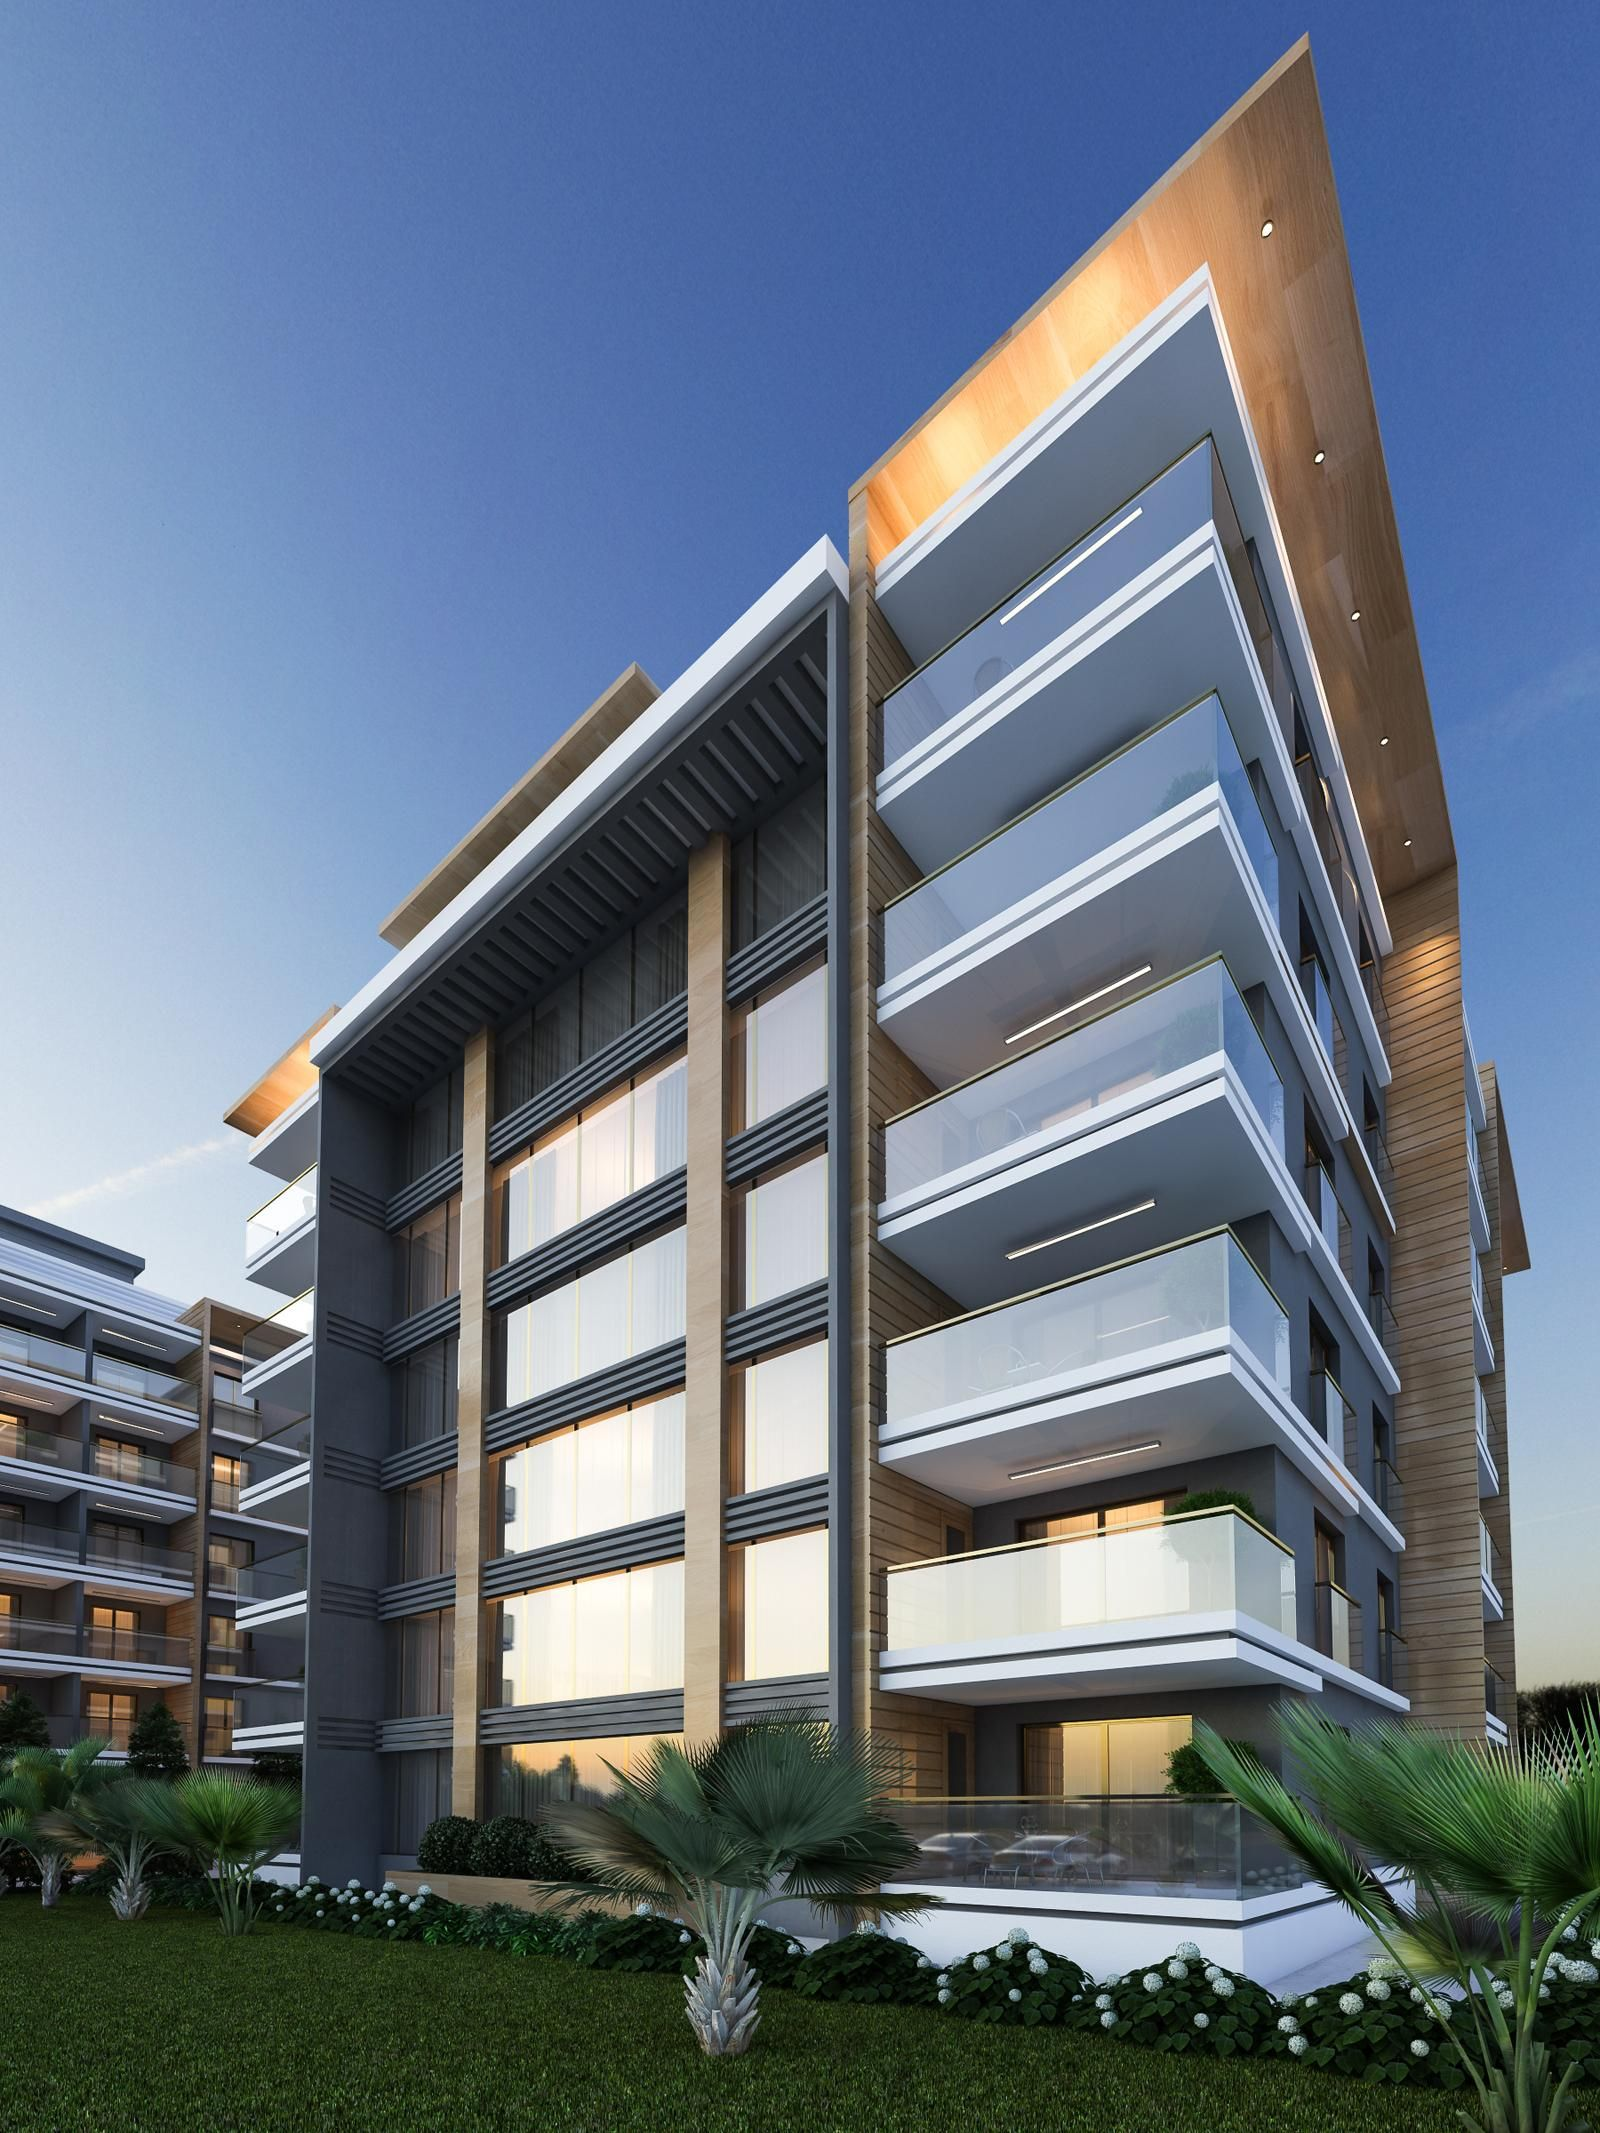 Toprak evler ideias de obra pinterest architecture for Modern residential architects